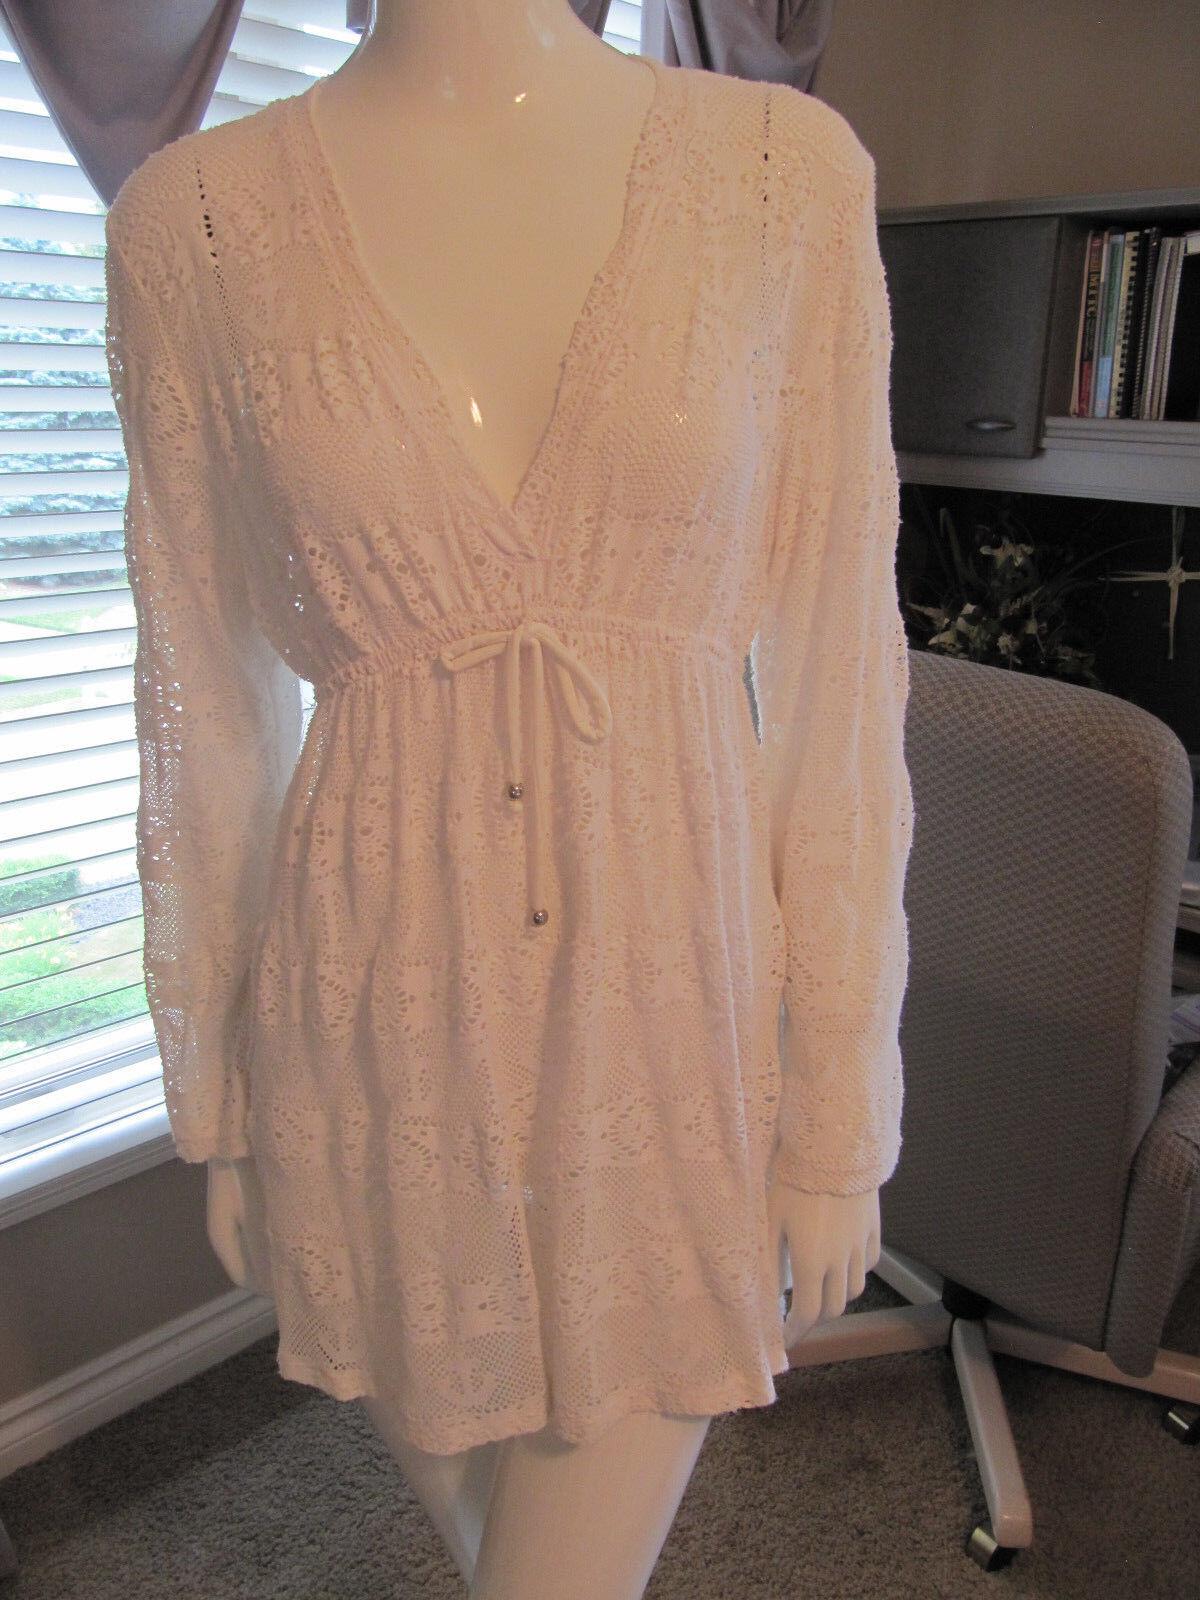 Nautica Women's White LaceTunic Swim Cover-Up Dress Dress Dress NWOT Small a7094c